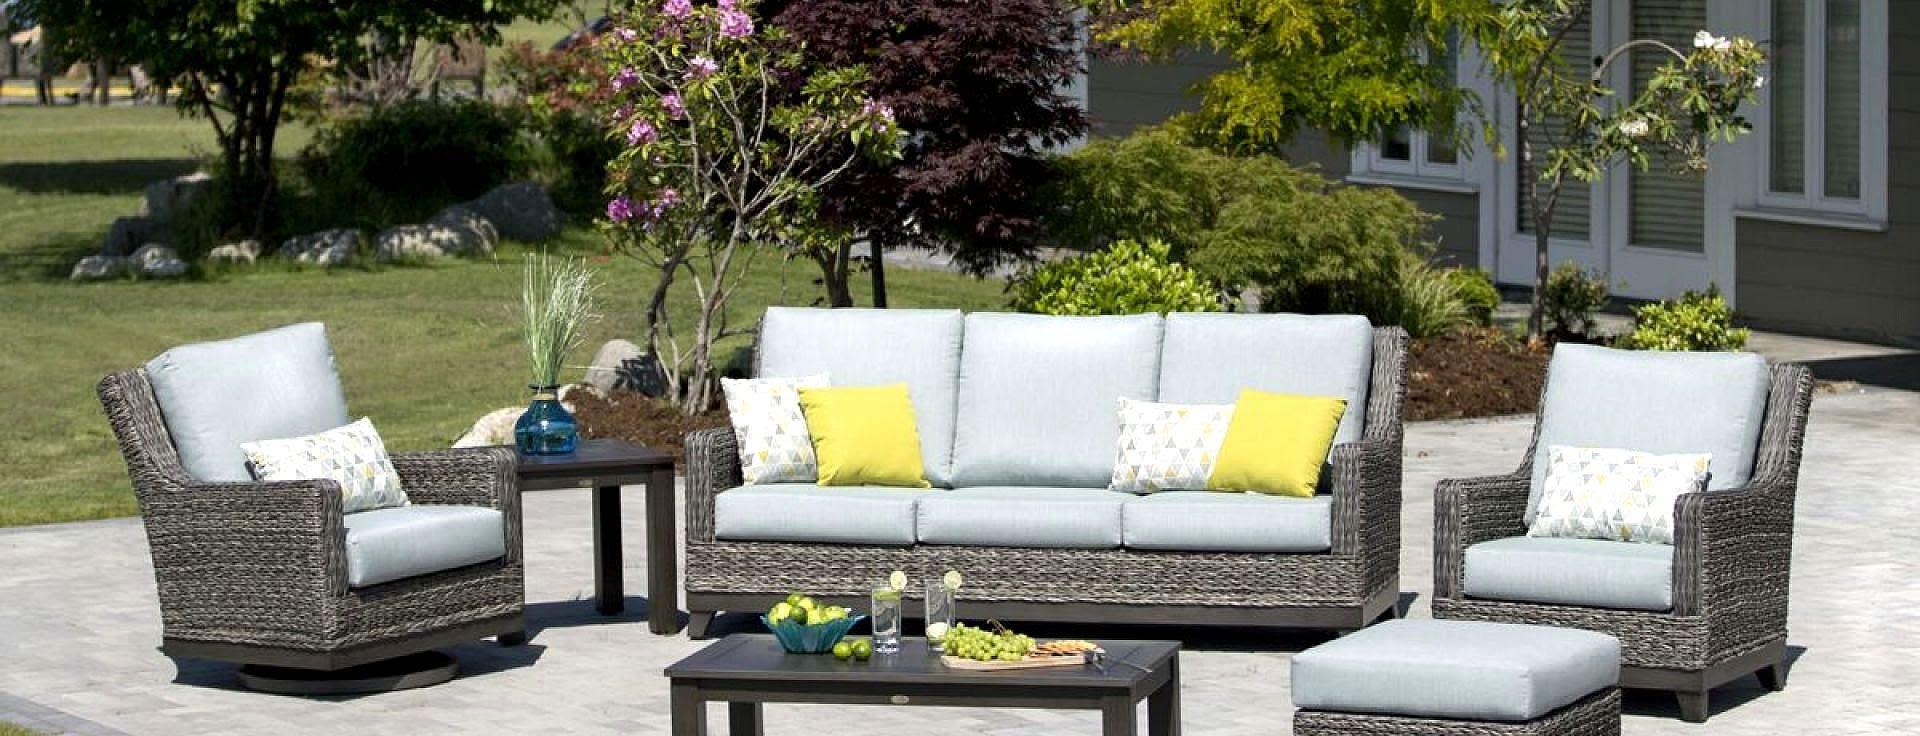 Patio & Outdoor Furniture Kitchener Waterloo, Hammocks ...